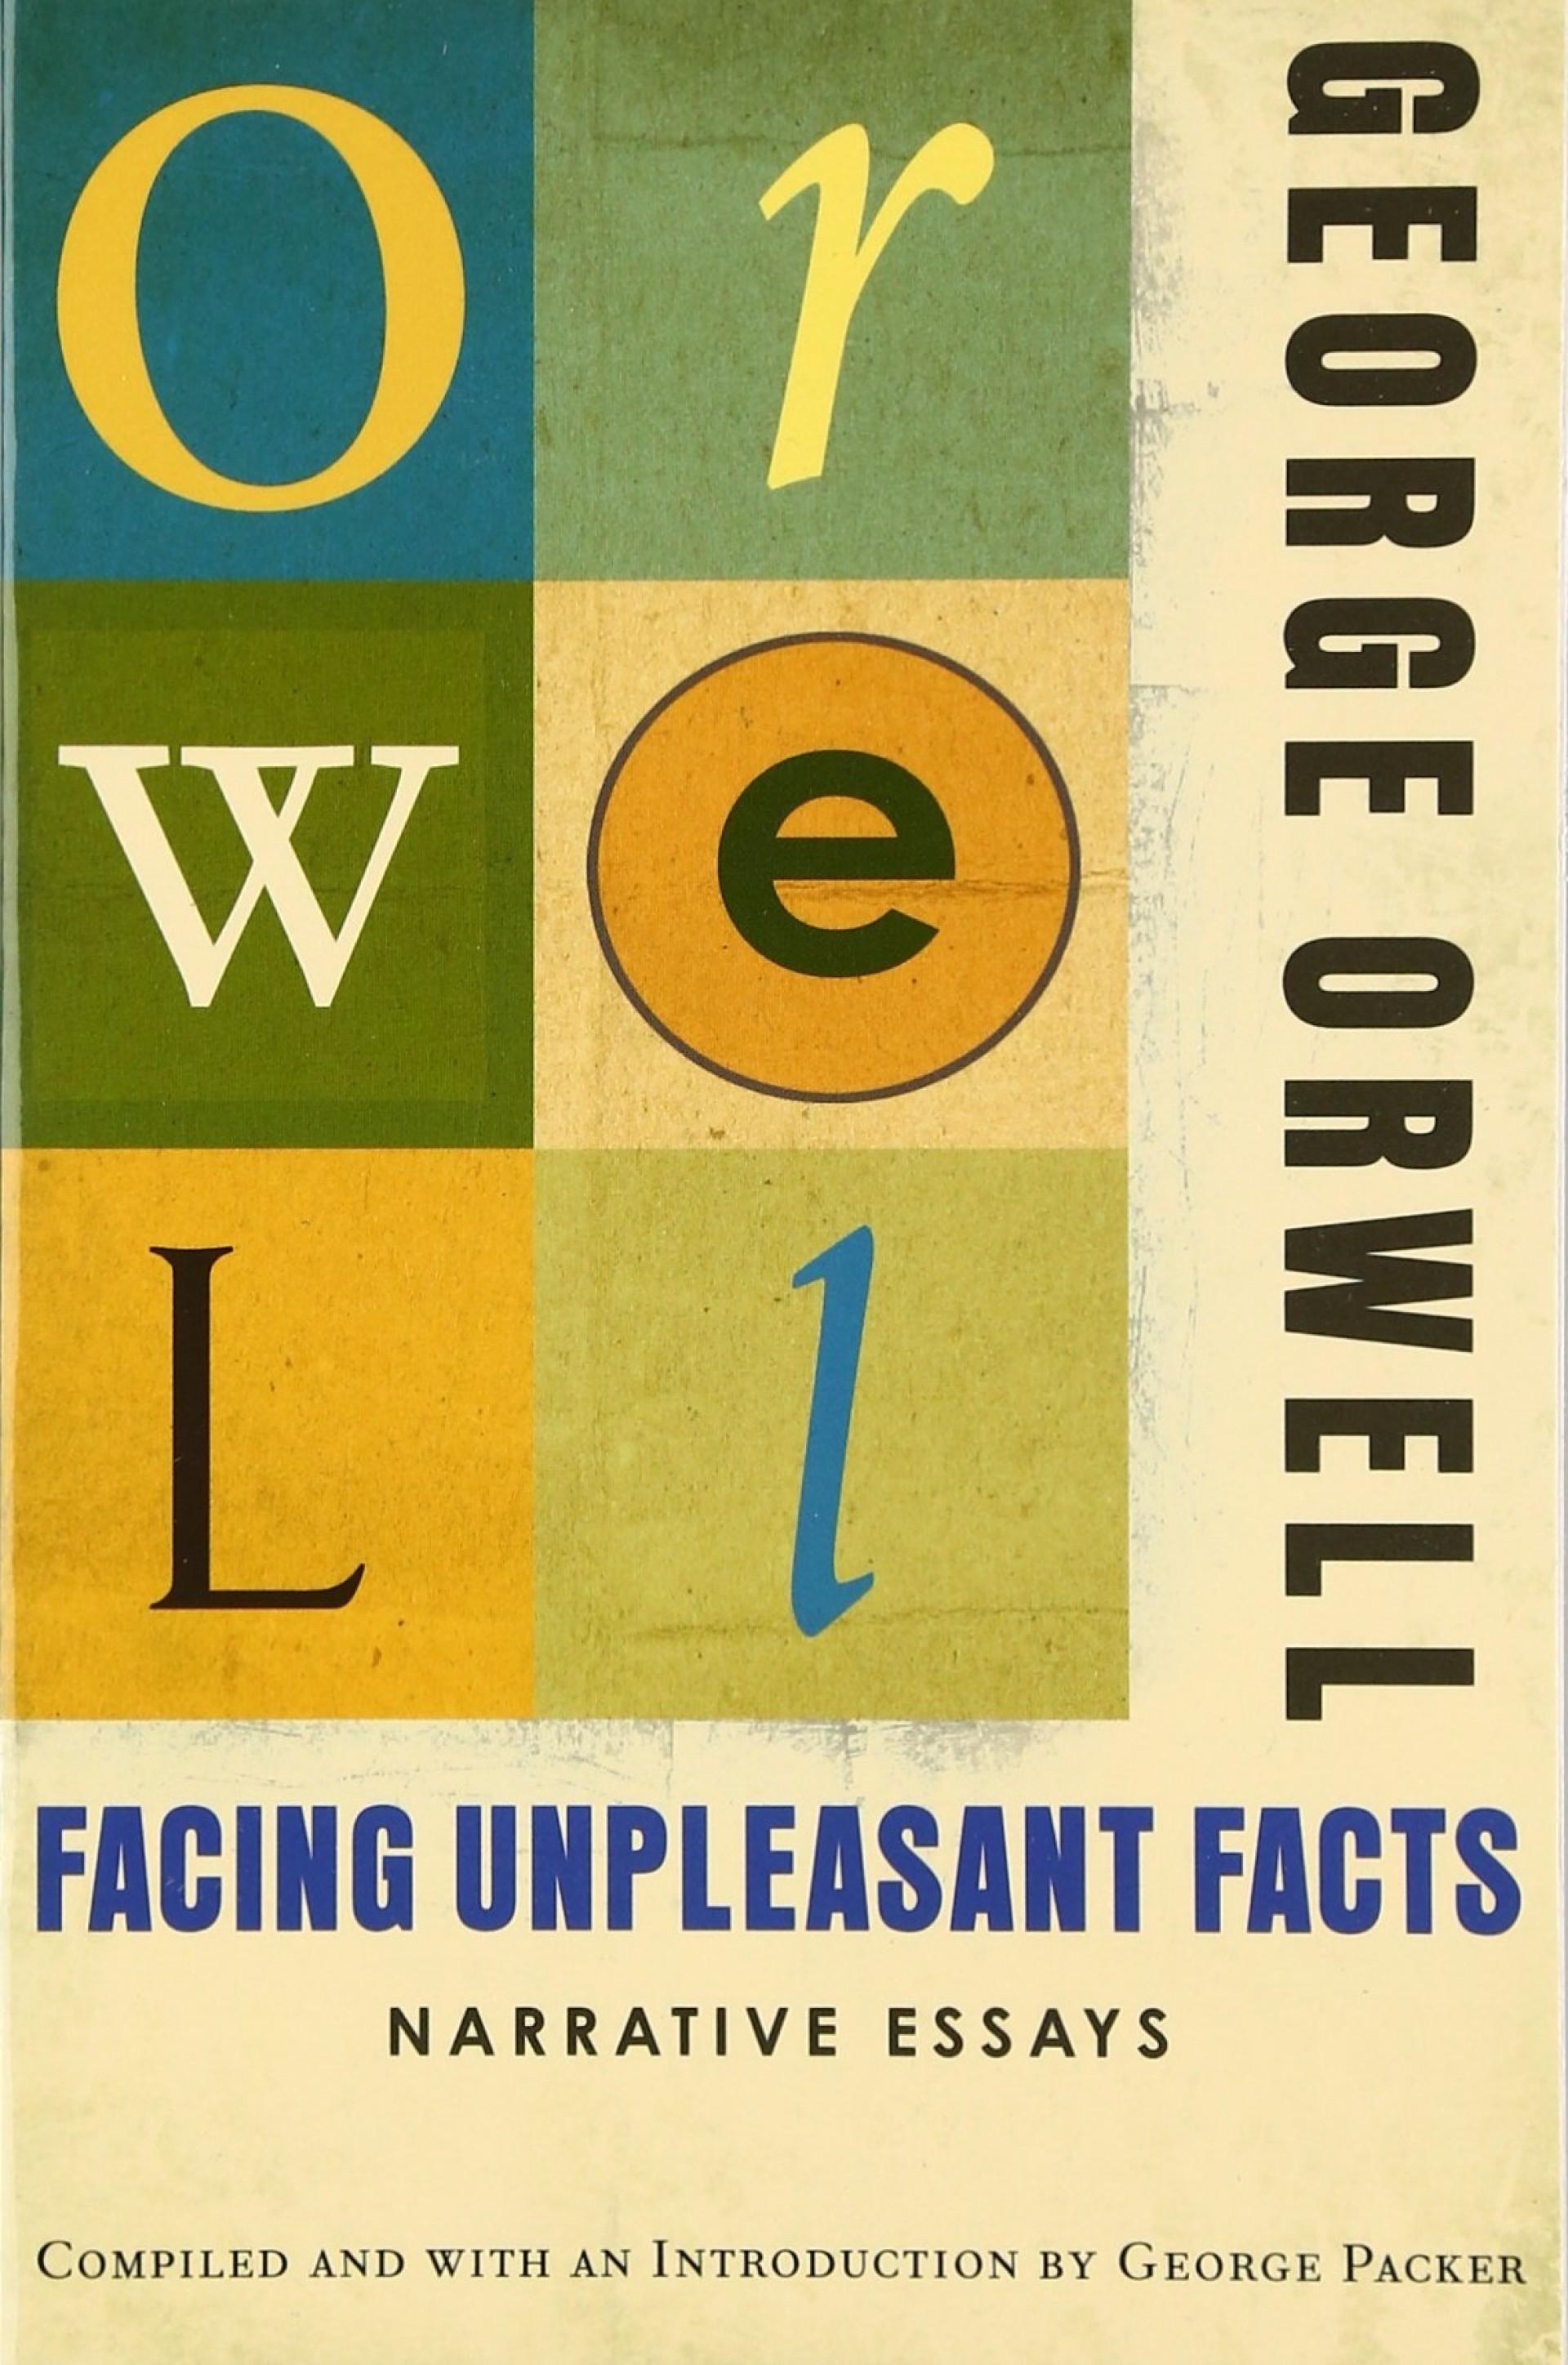 007 Essay Example Orwell Essays Singular Themes Epub George Pdf Download 1920